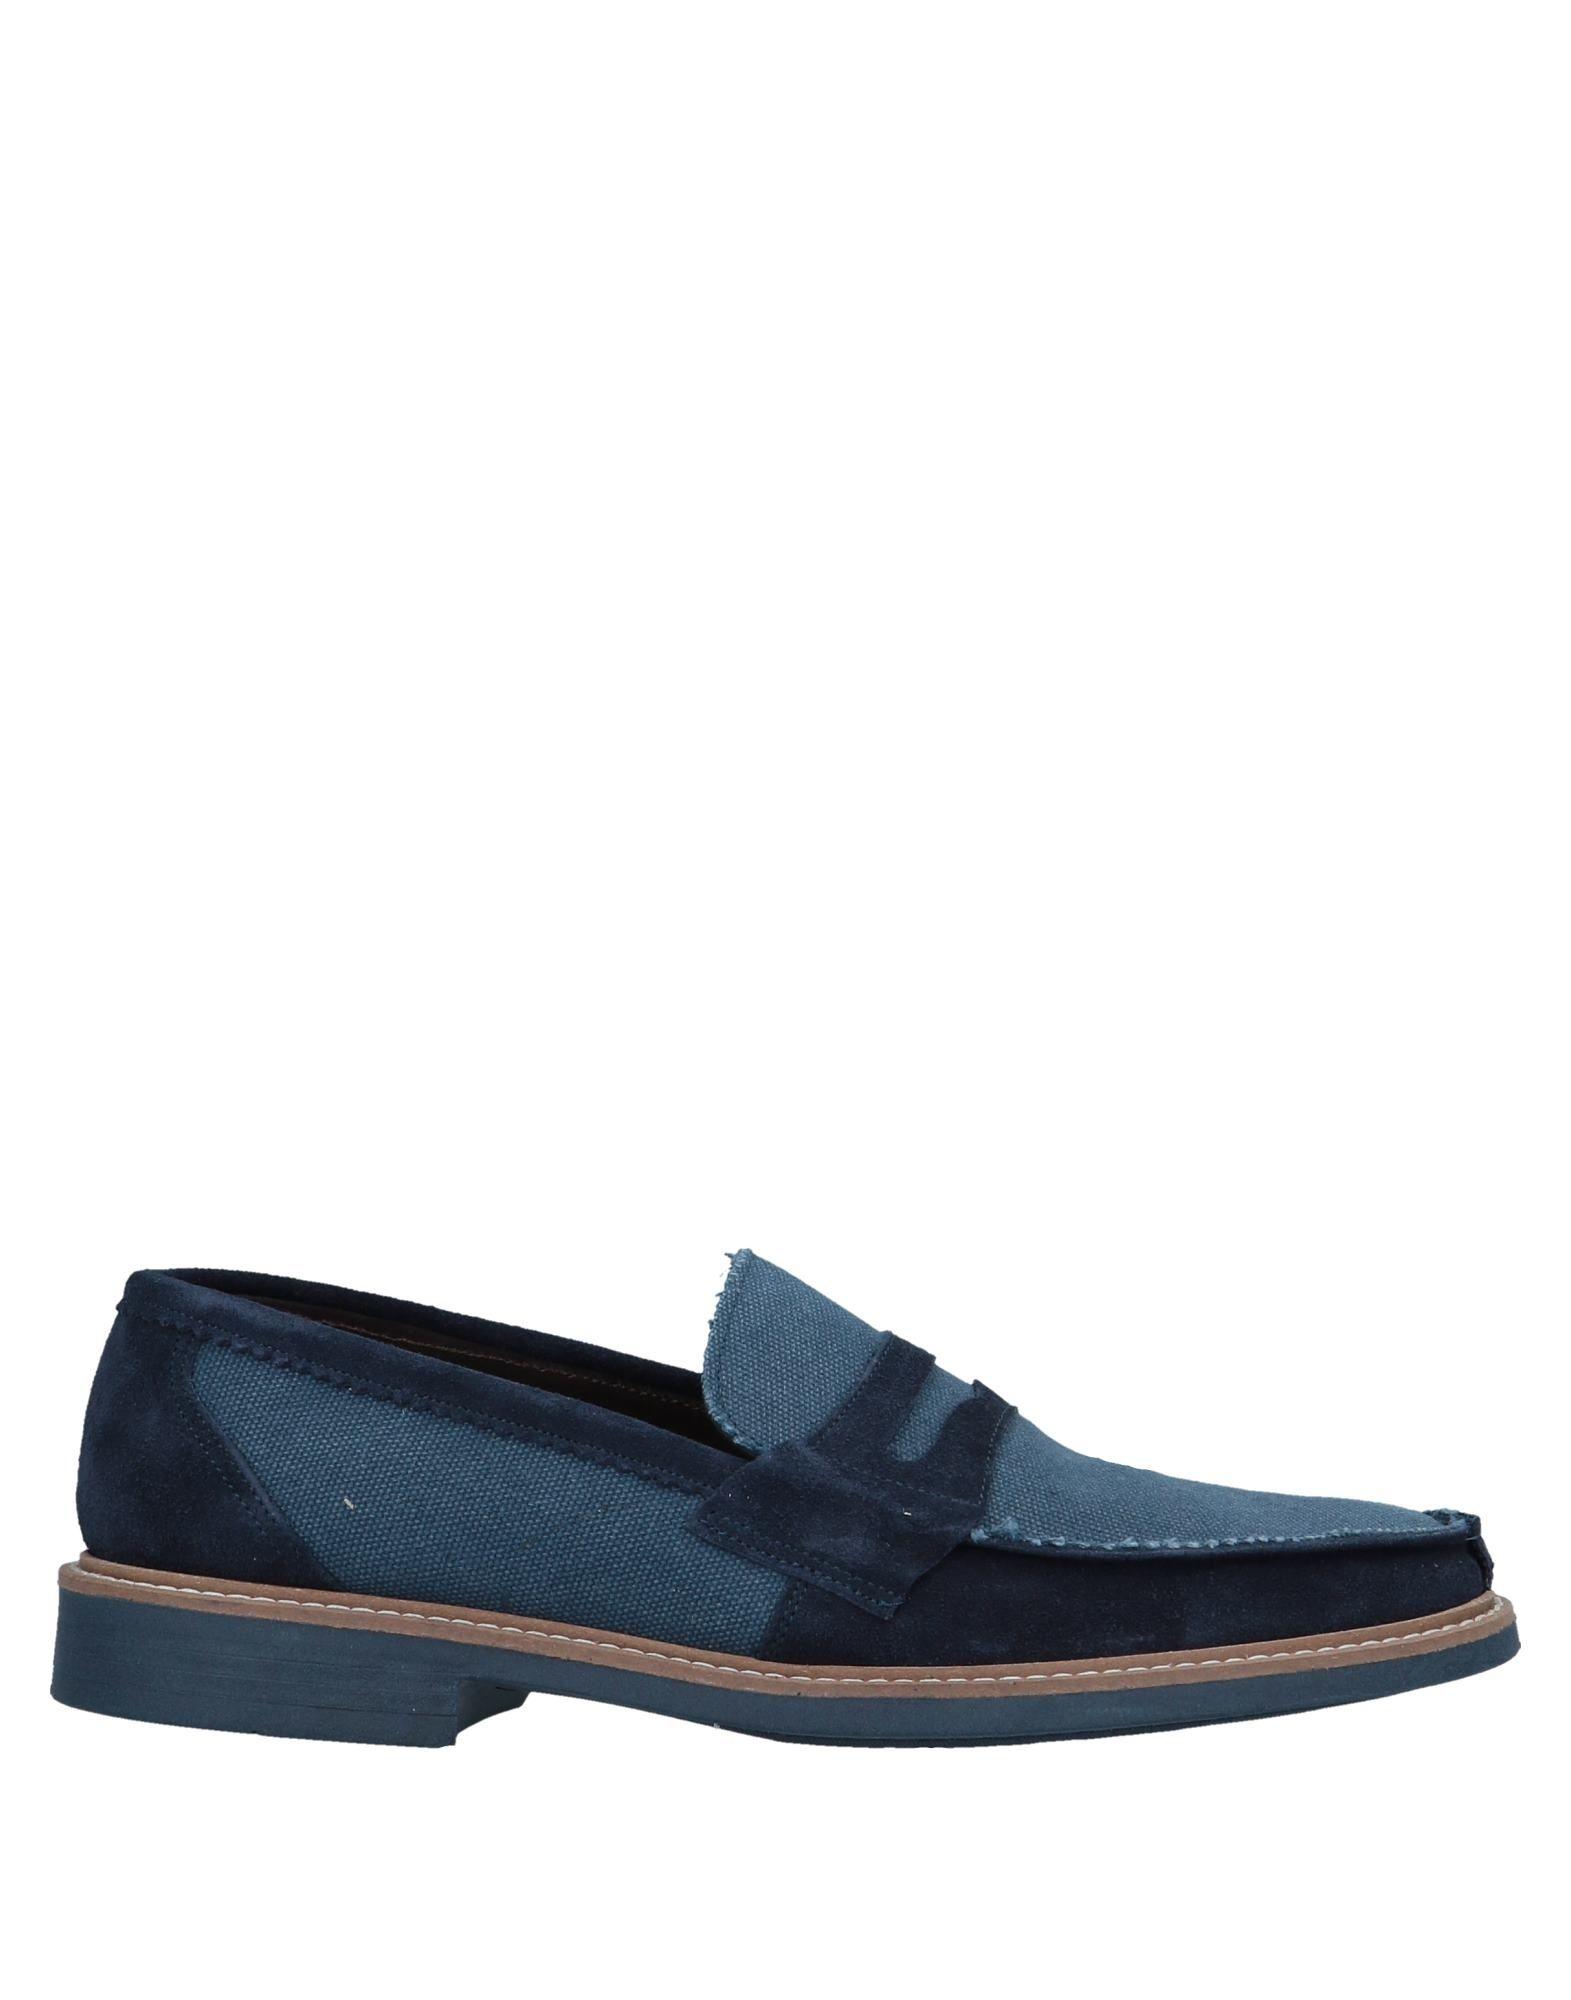 Cristiano Rossani® Mokassins Herren    11557545KO Gute Qualität beliebte Schuhe 9e7efc